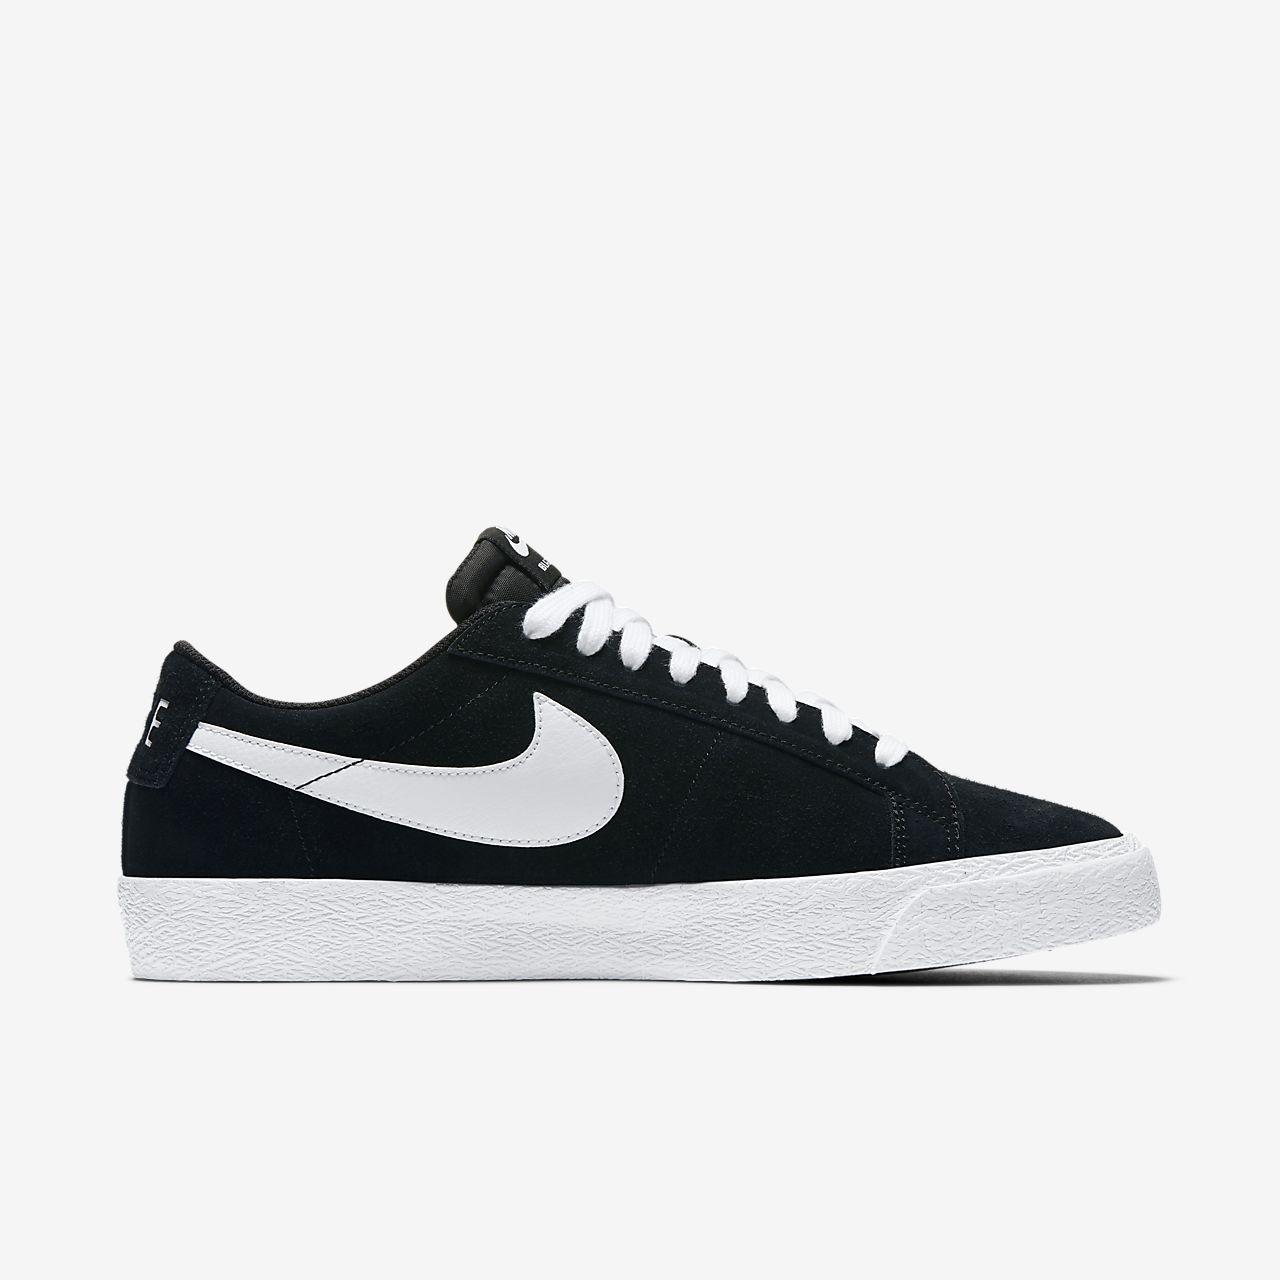 Nike Sb Zoom Blazer Low Scarpa nero bianco Venta Grande Del Envío Libre JMpkwf0